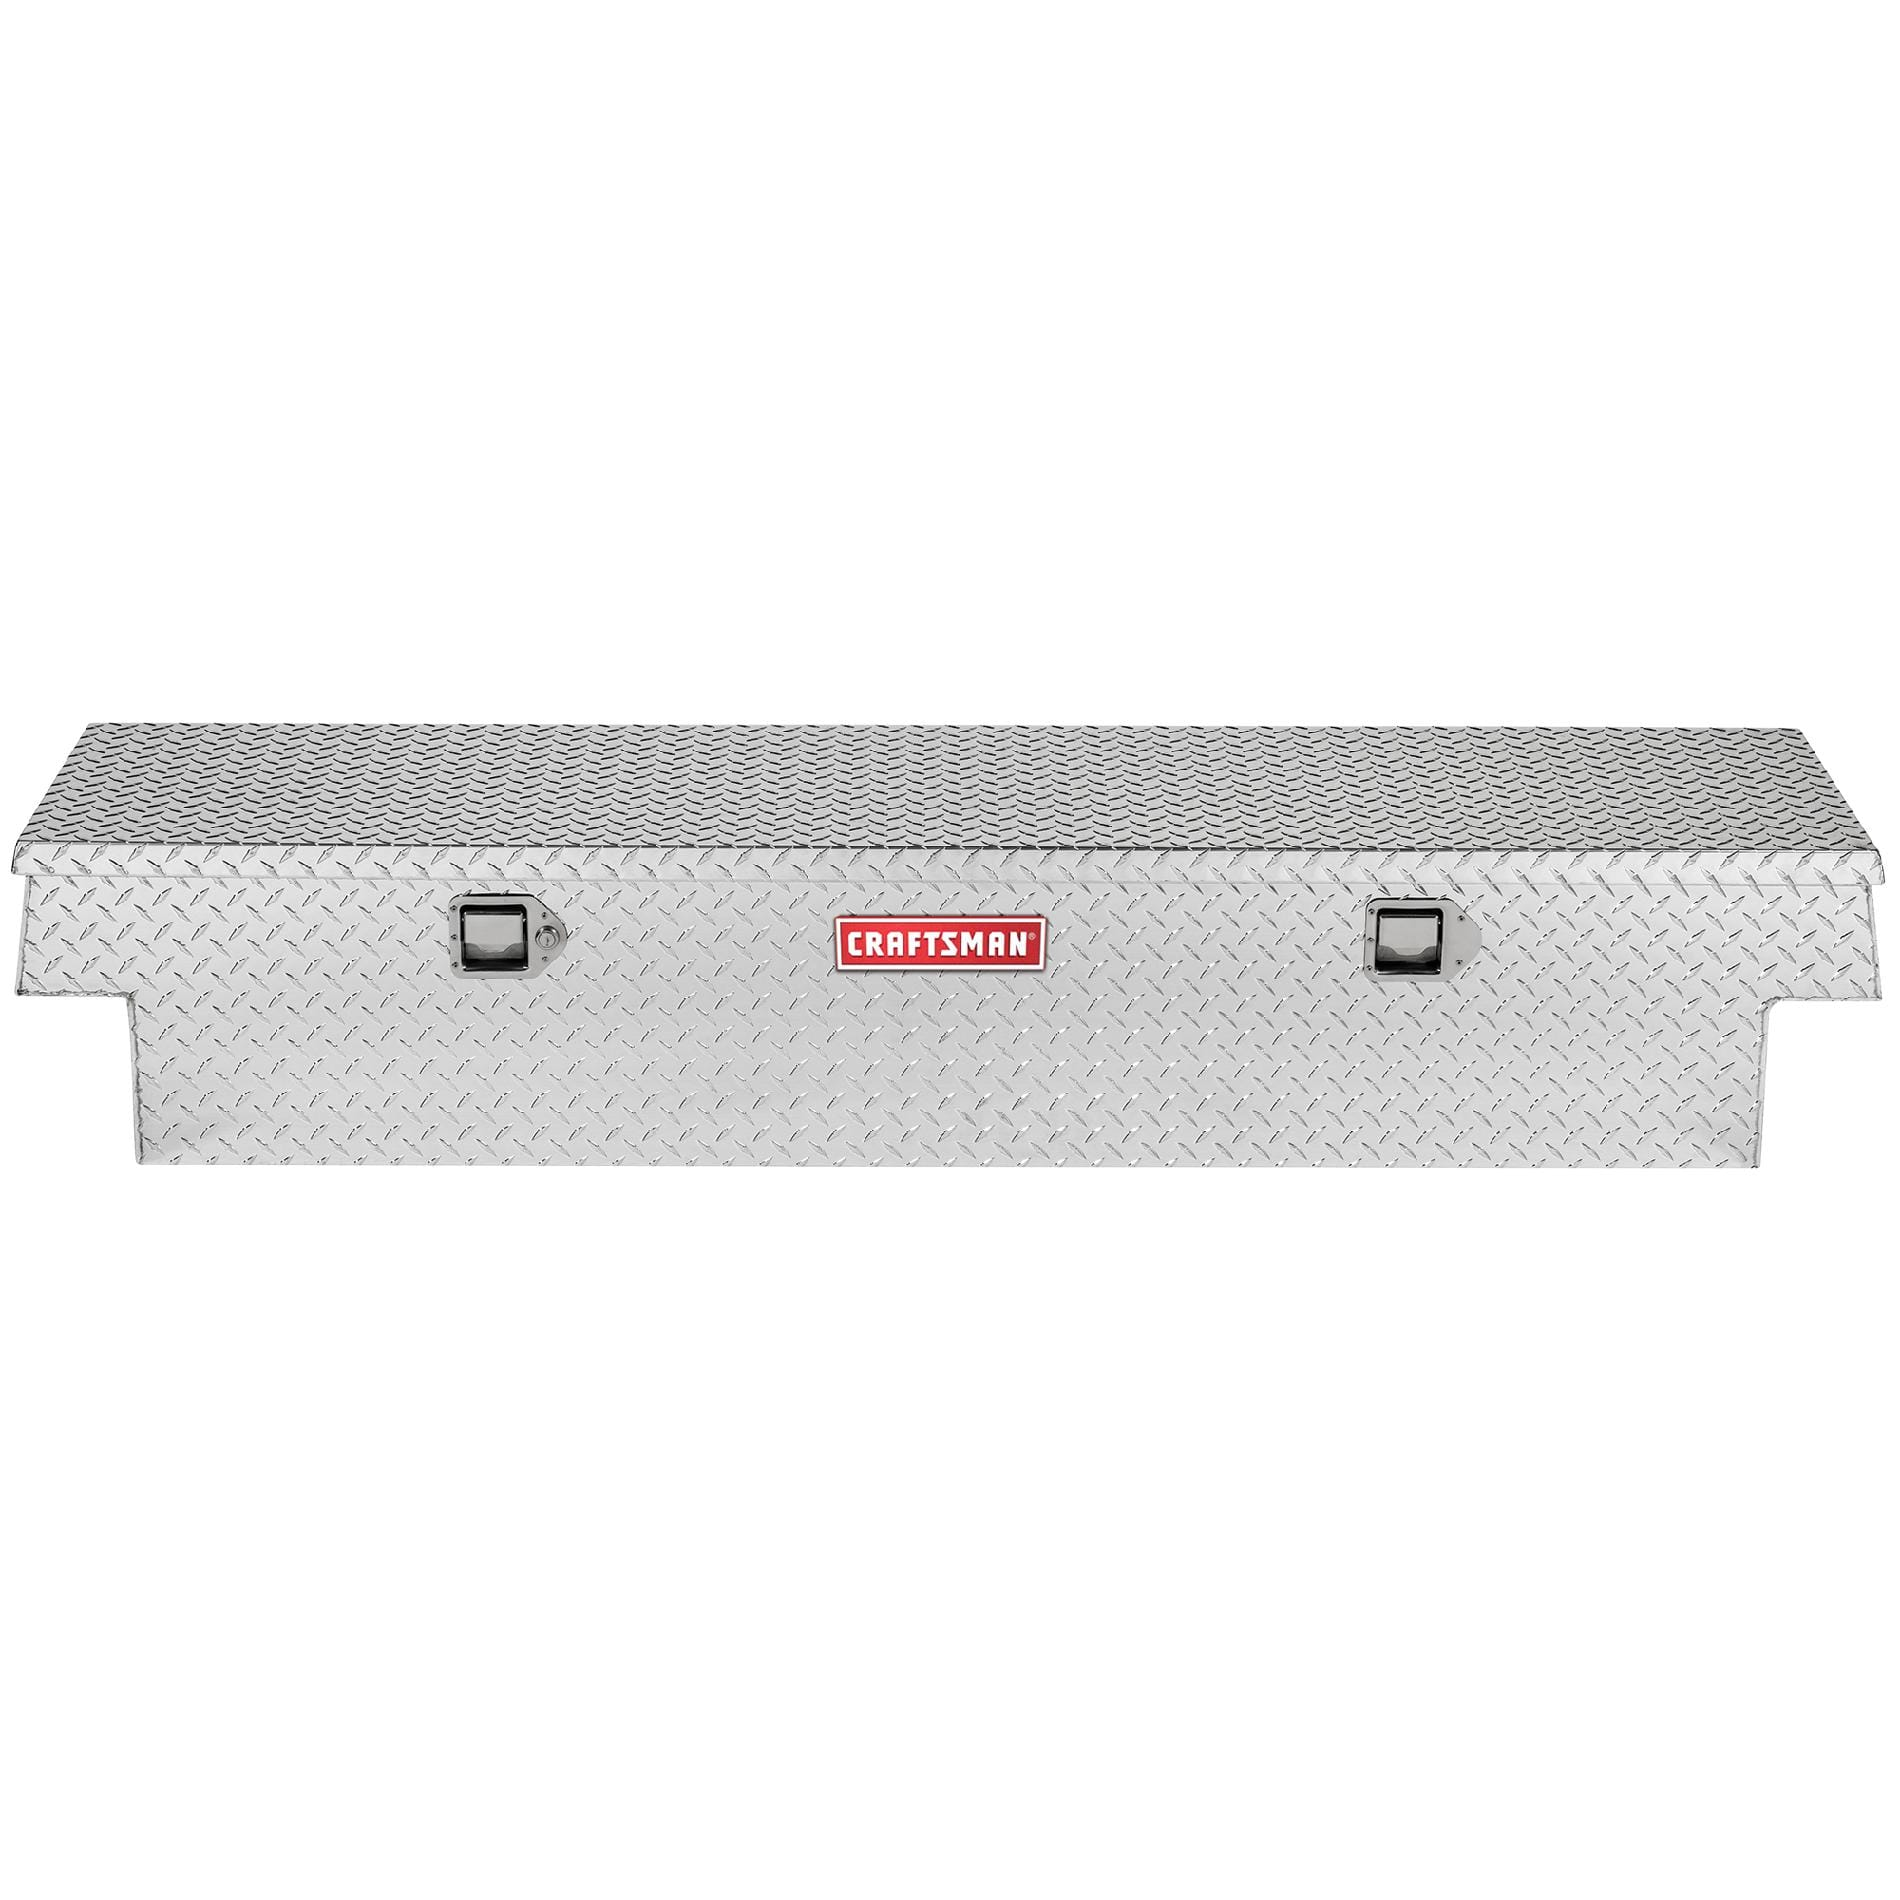 Craftsman Fullsize Aluminum Single Lid Truck Box $53.92 + $10.53 SYW. Free Store Pickup *YMMV*